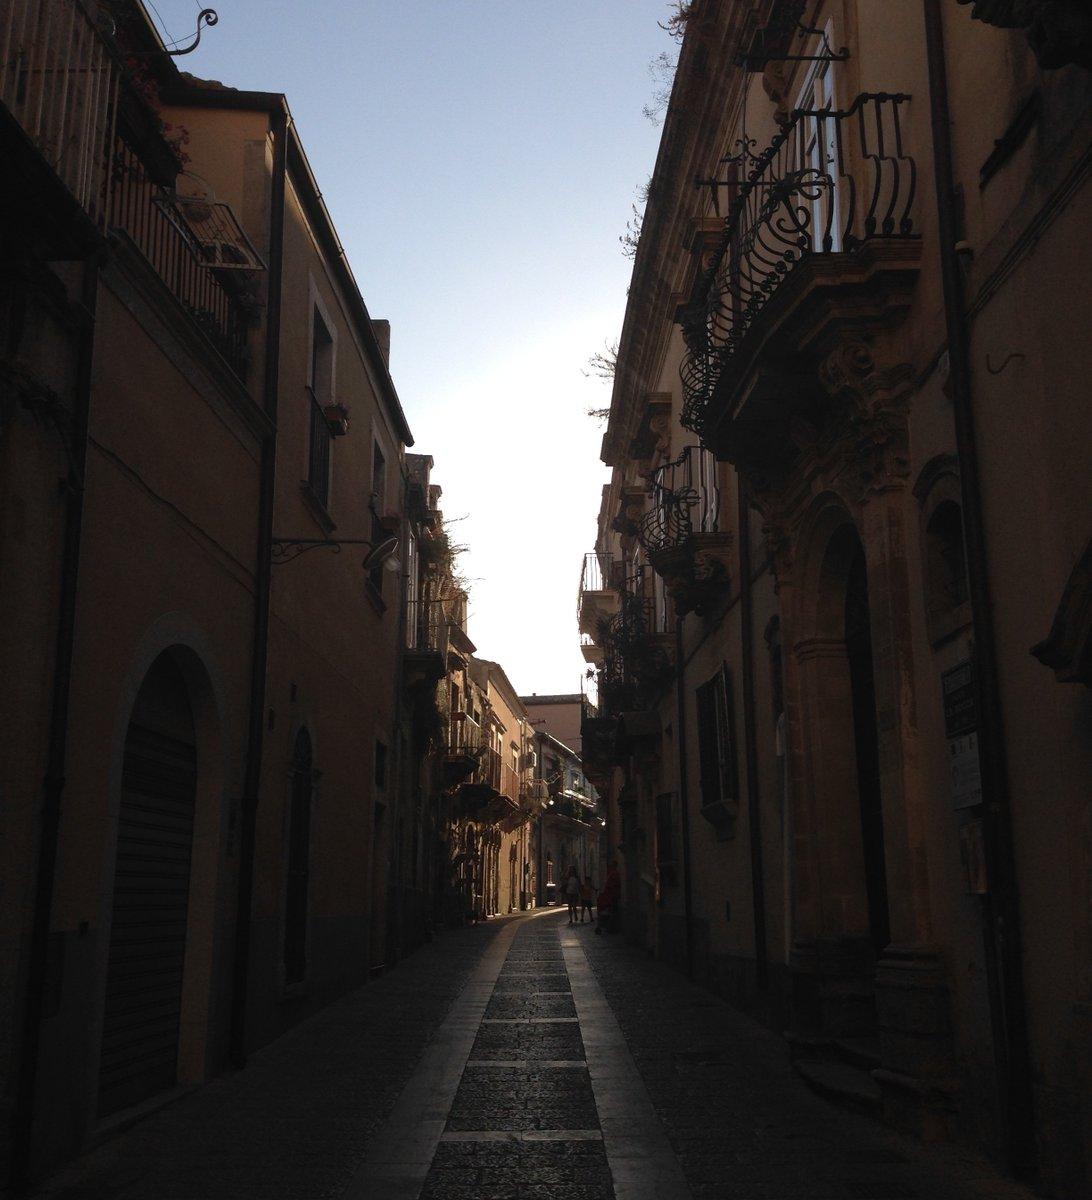 #sunset in the #city #sicilia #italia #bellaitalia #vacanzeitaliane #vacanzeinitalia #italiandays #travelphotografy #tagsta_travel #amazing  #aroundtheworld #tourist #worldplaces #traveler #goodvibes #luxurytravel #happyday #livesocial #digitalnomadpic.twitter.com/PW9jaUXafh